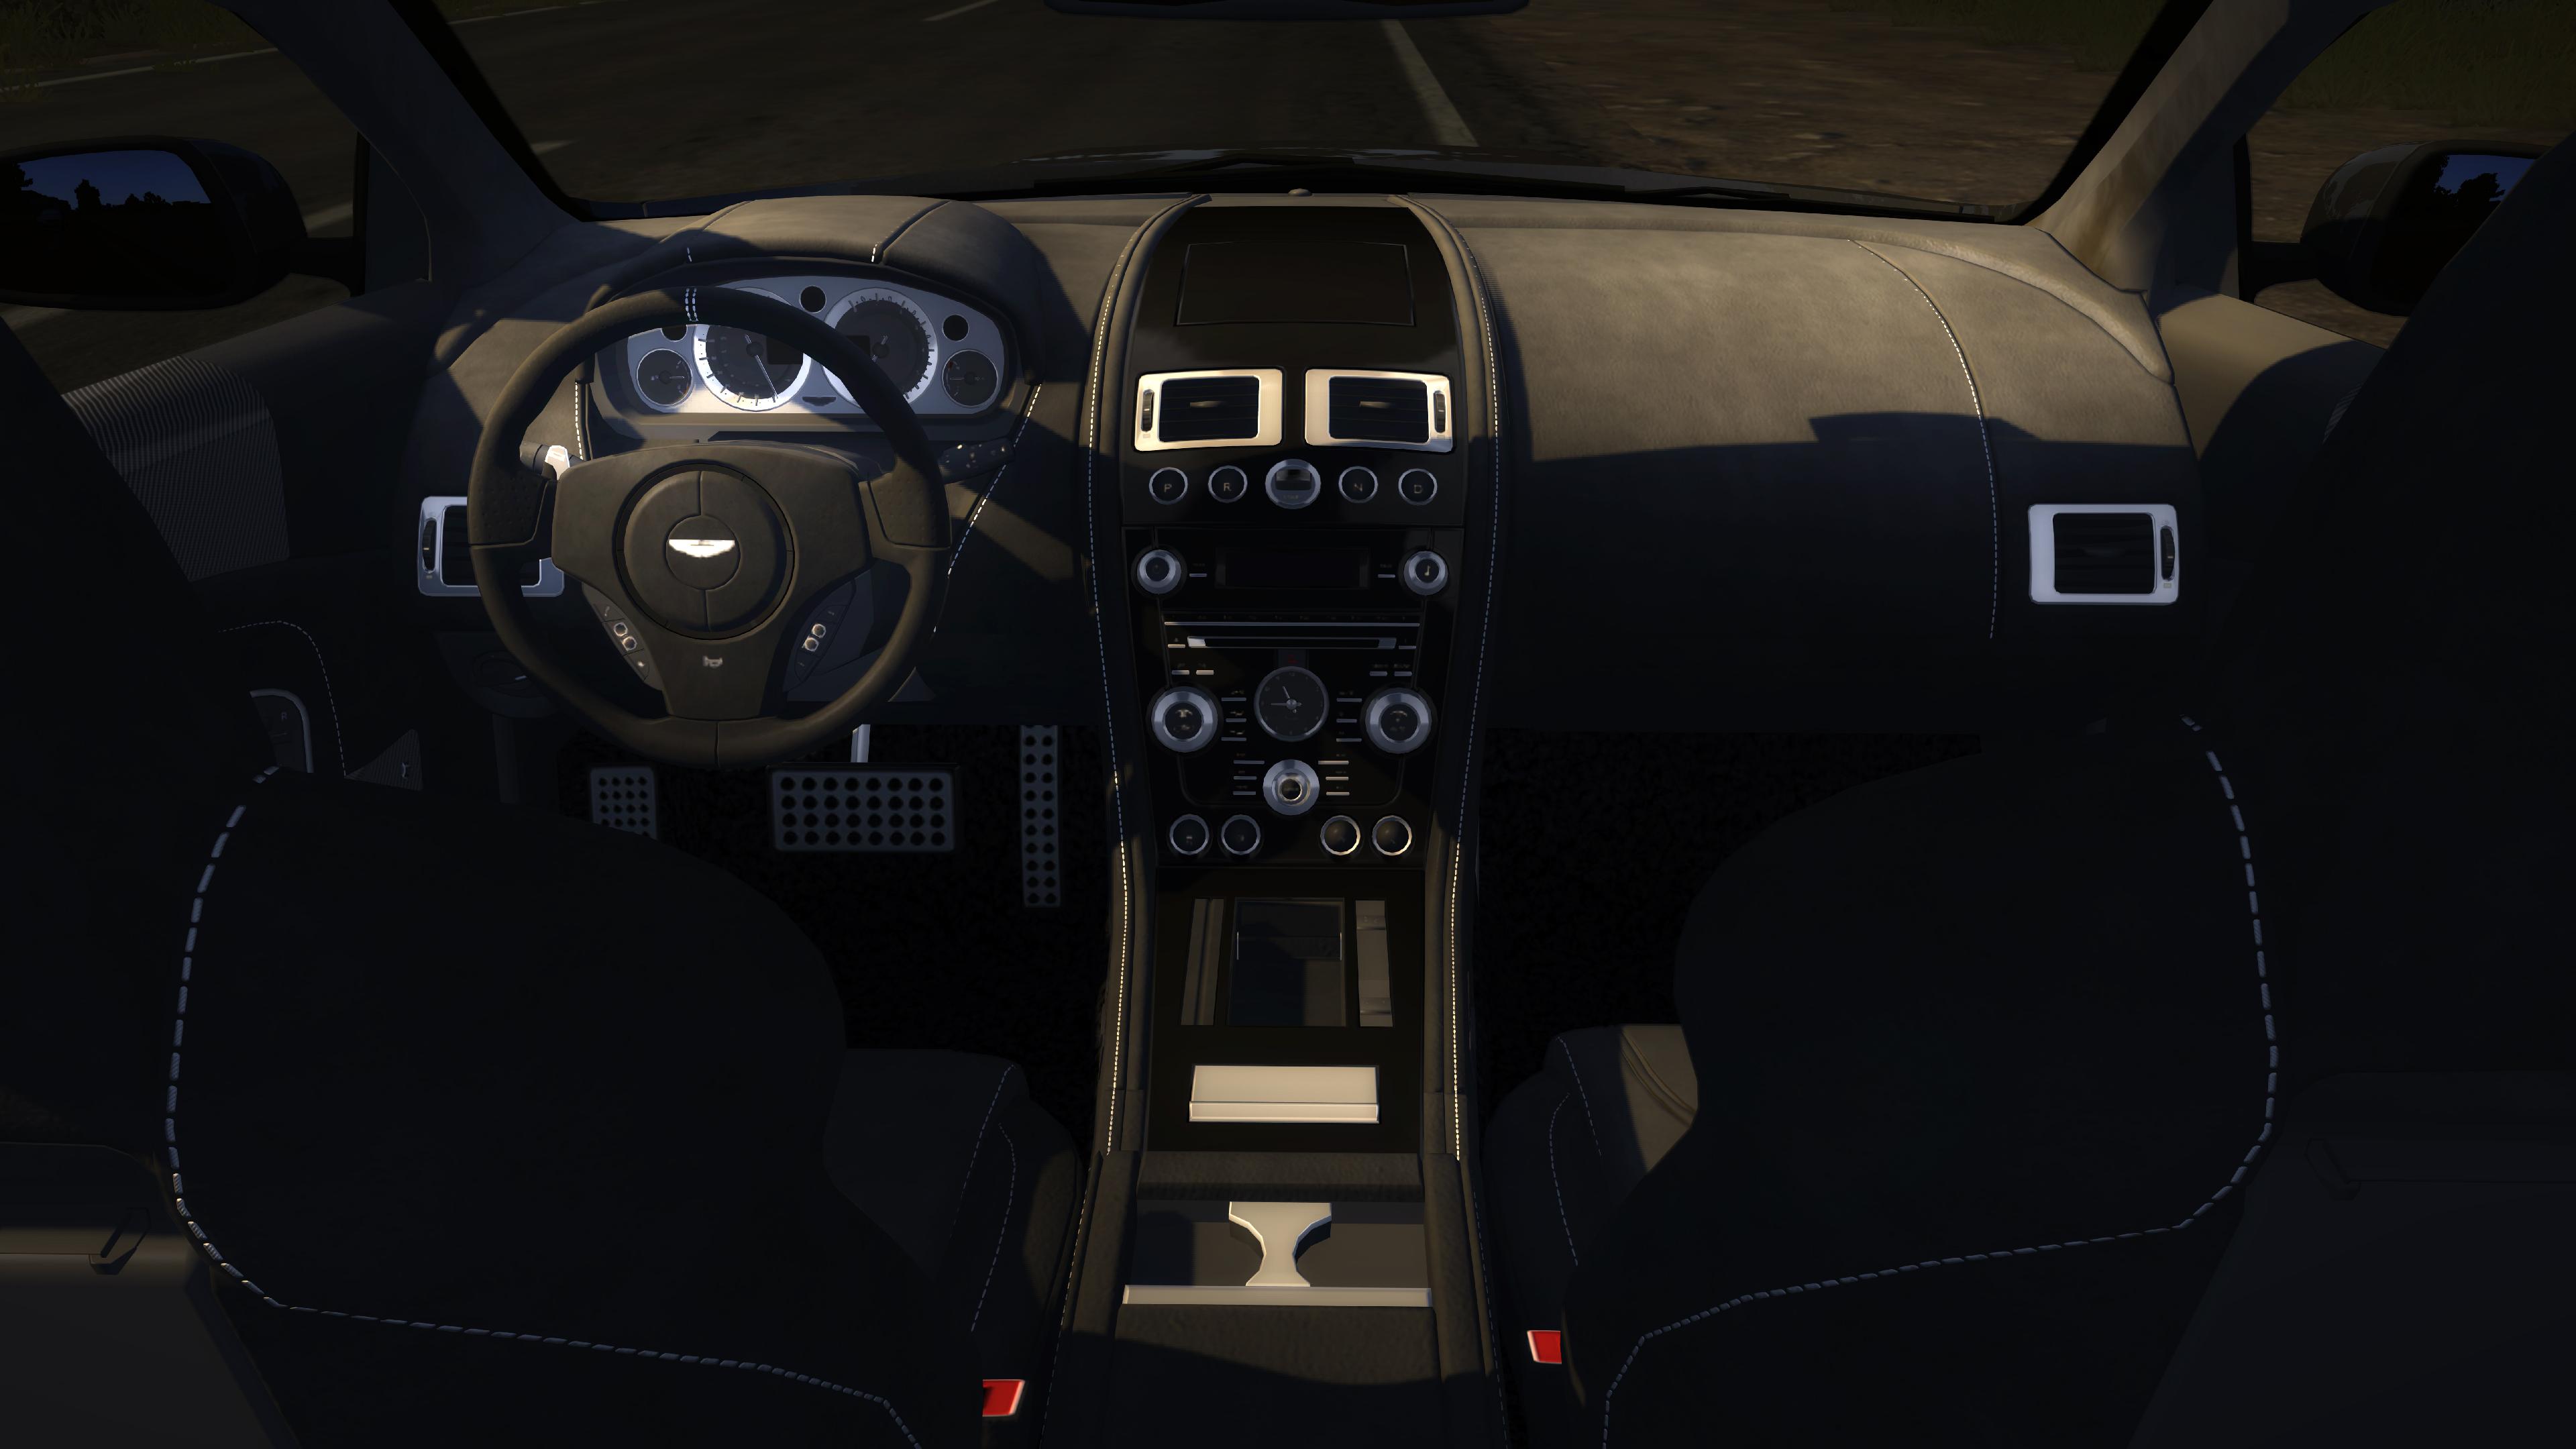 Test Drive Unlimited 2 Aston Martin Dbs Interior